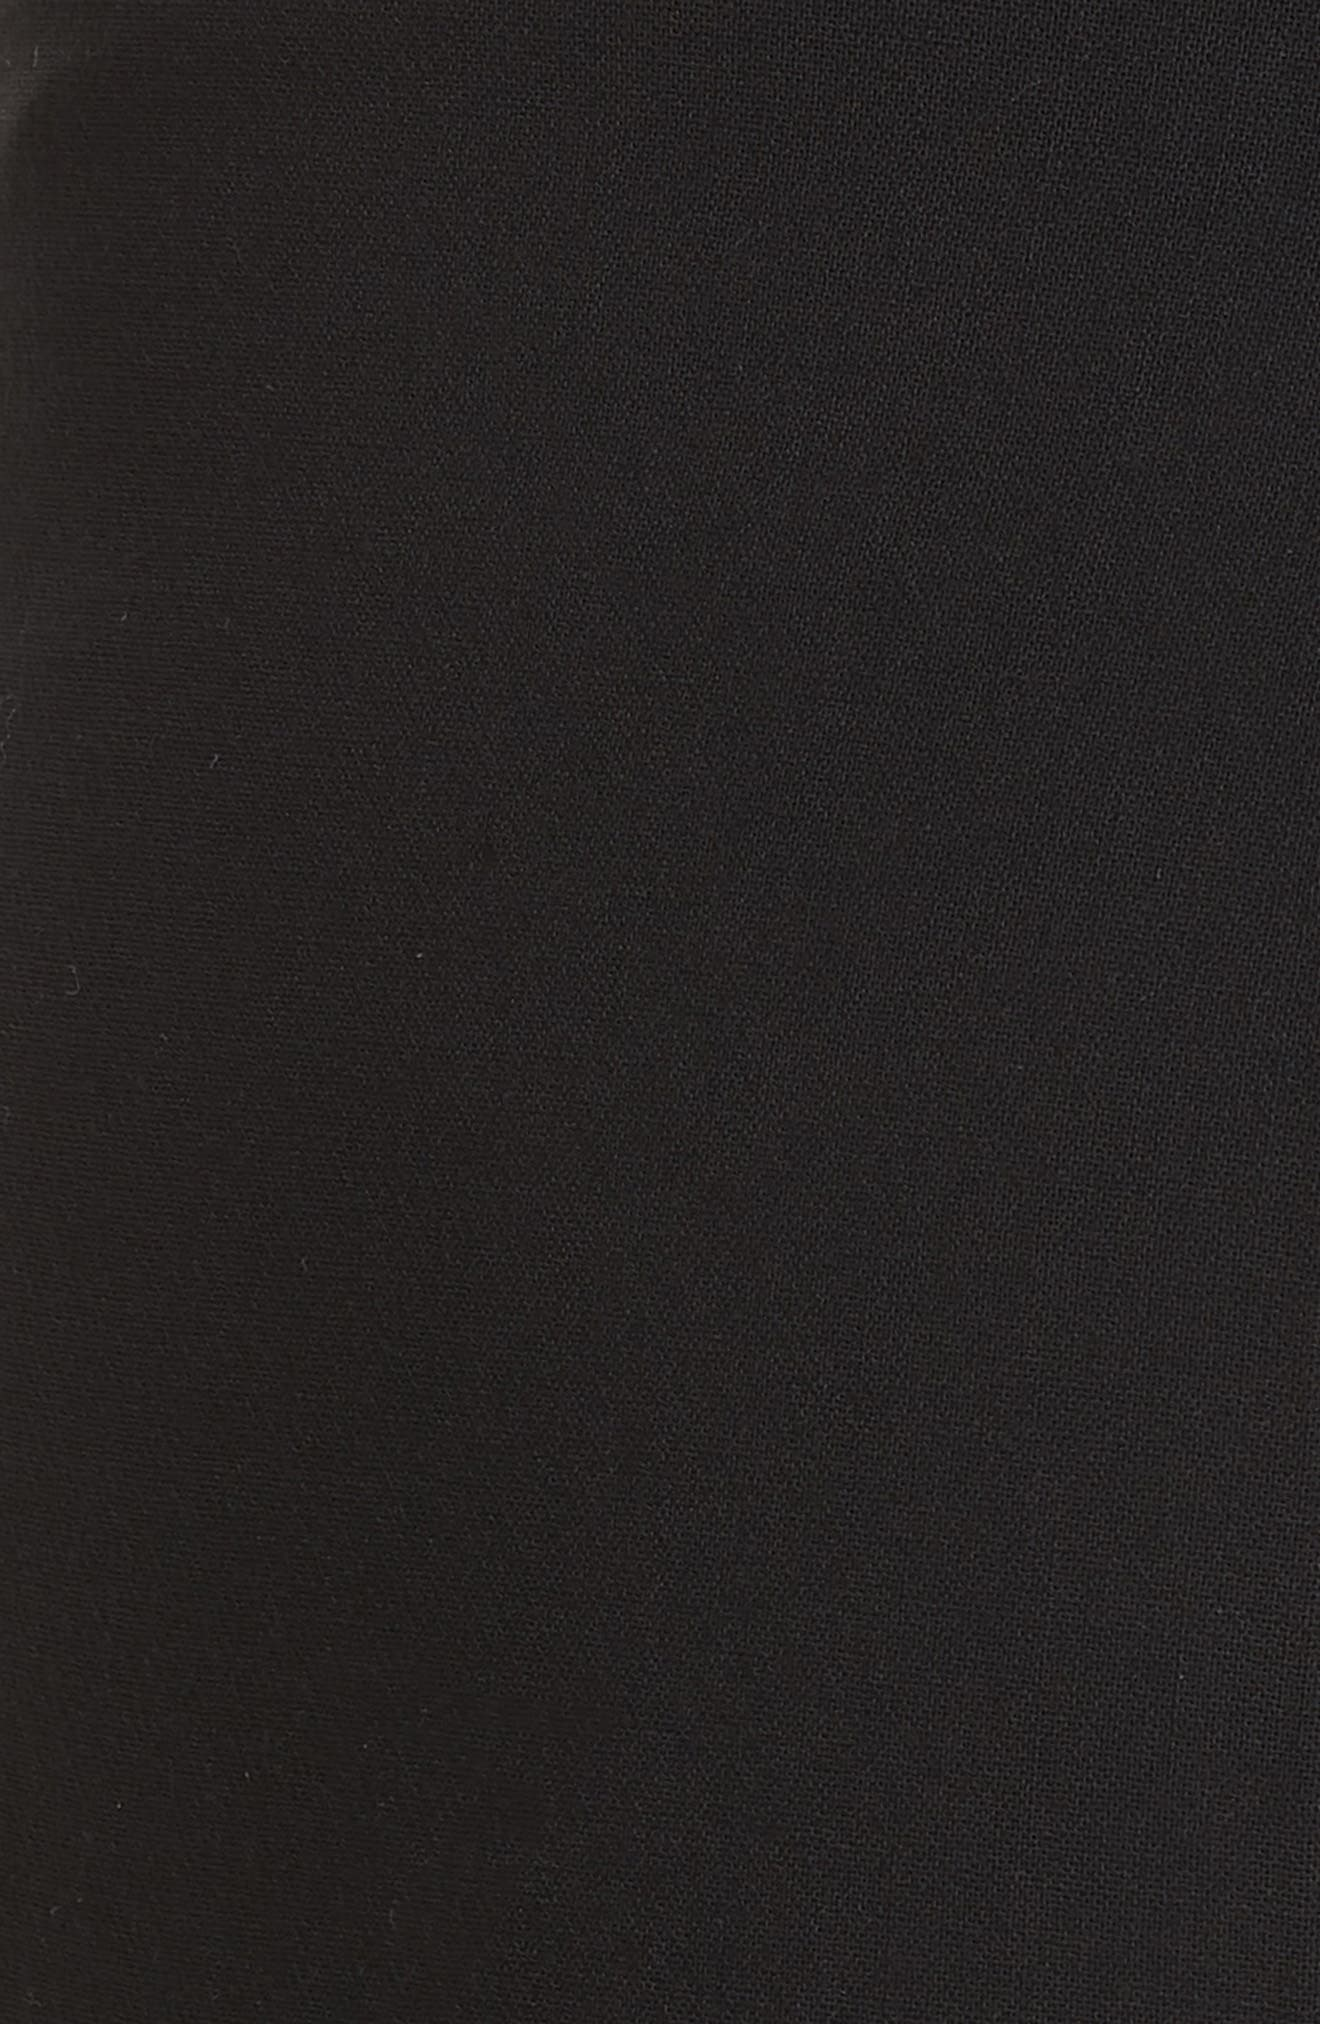 AKRIS, Farrah Stretch Wool Flare Pants, Alternate thumbnail 5, color, BLACK